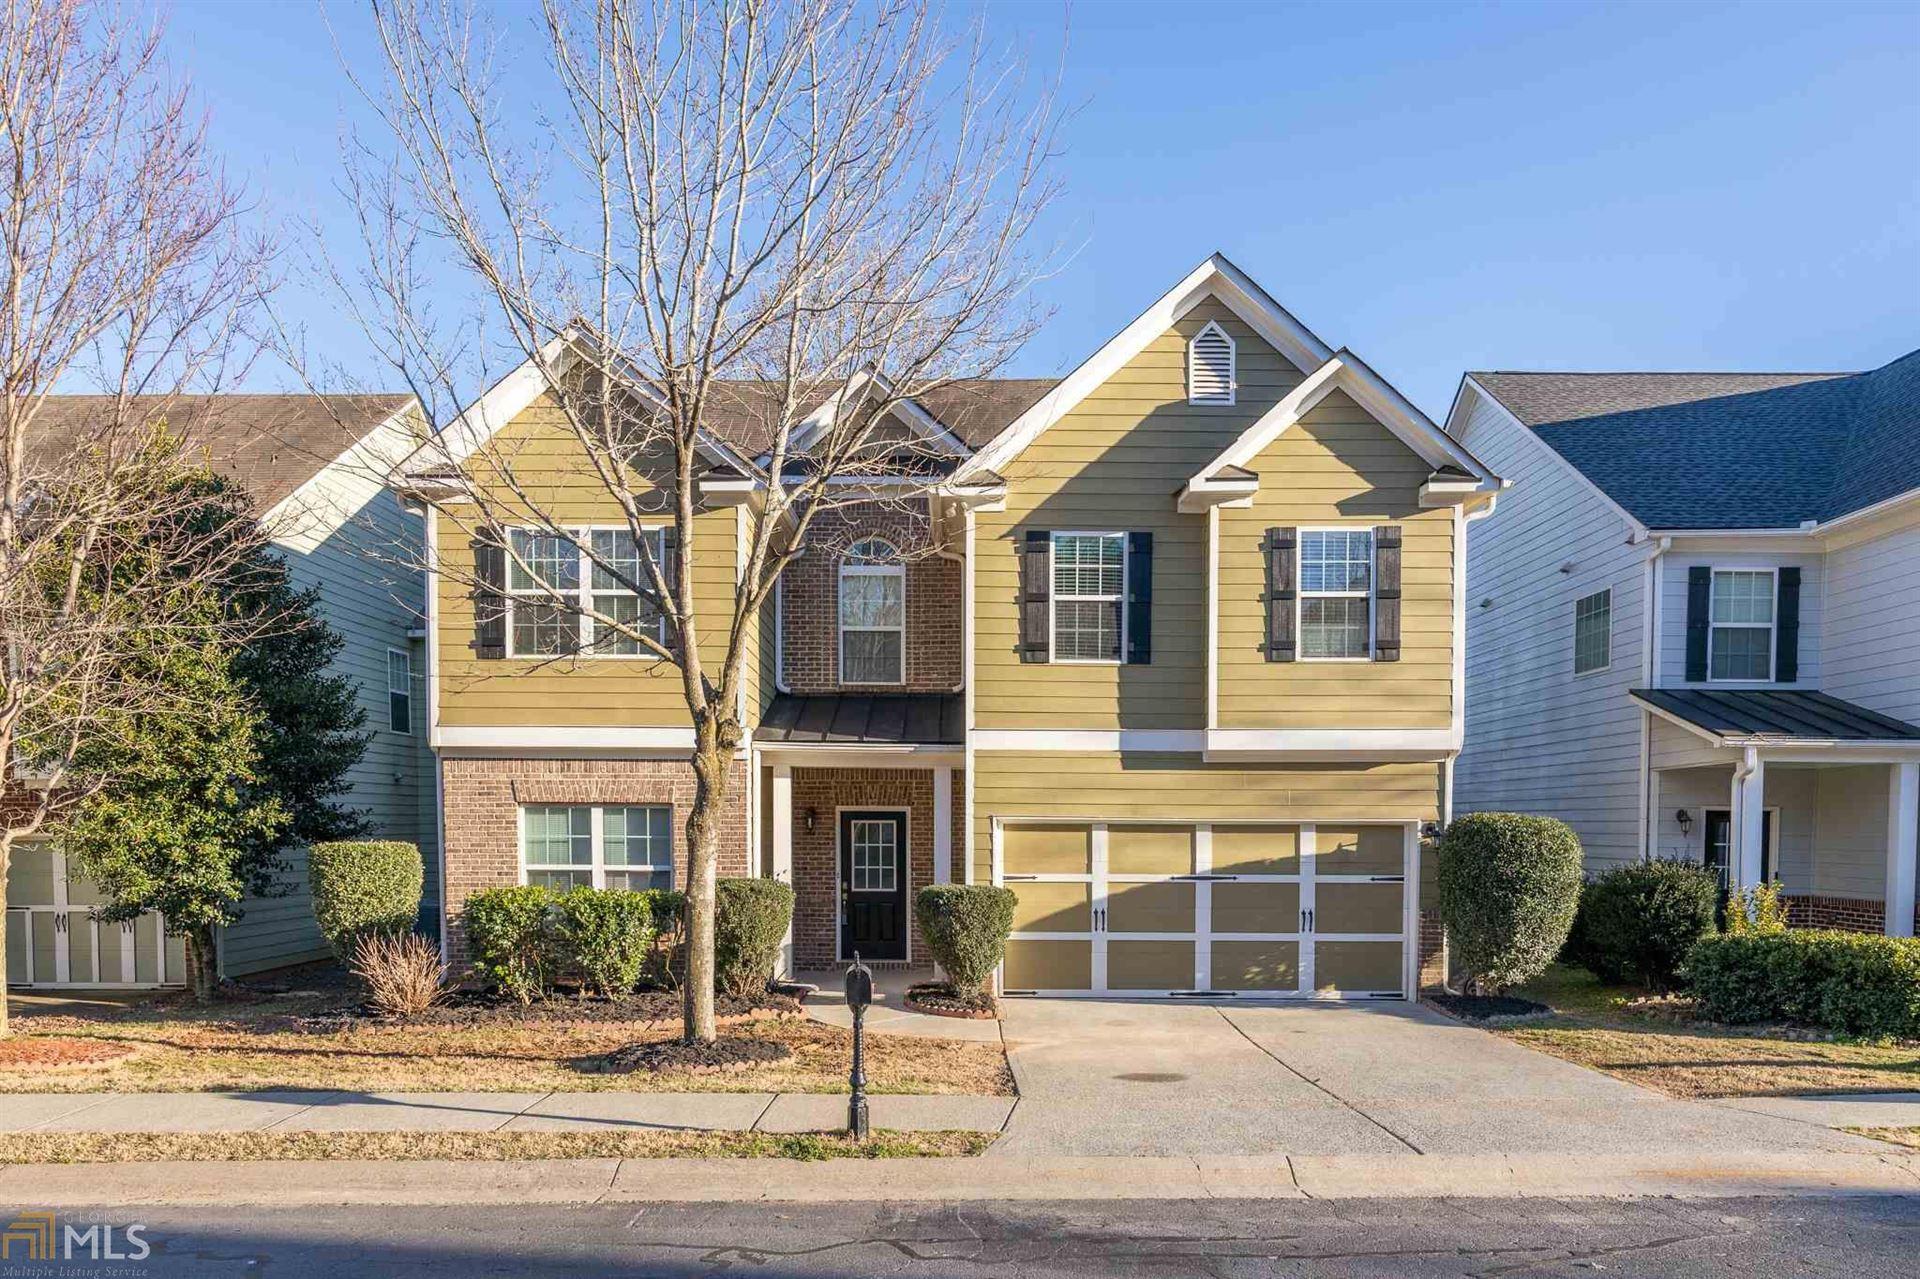 5191 Apple Grove Rd, Buford, GA 30519 - #: 8931876